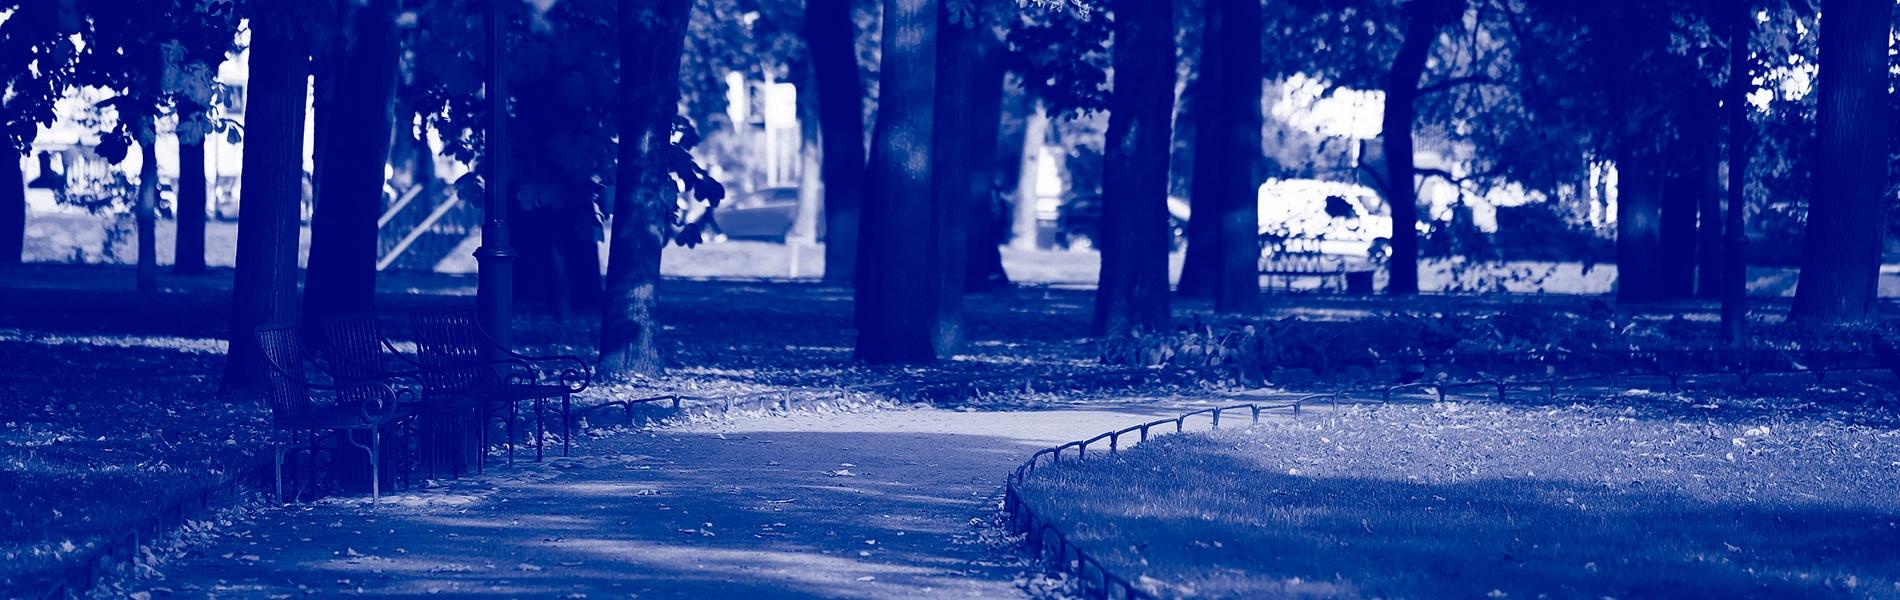 socialvictory-perfectmind-championsway_park_conservation1900x600.jpg